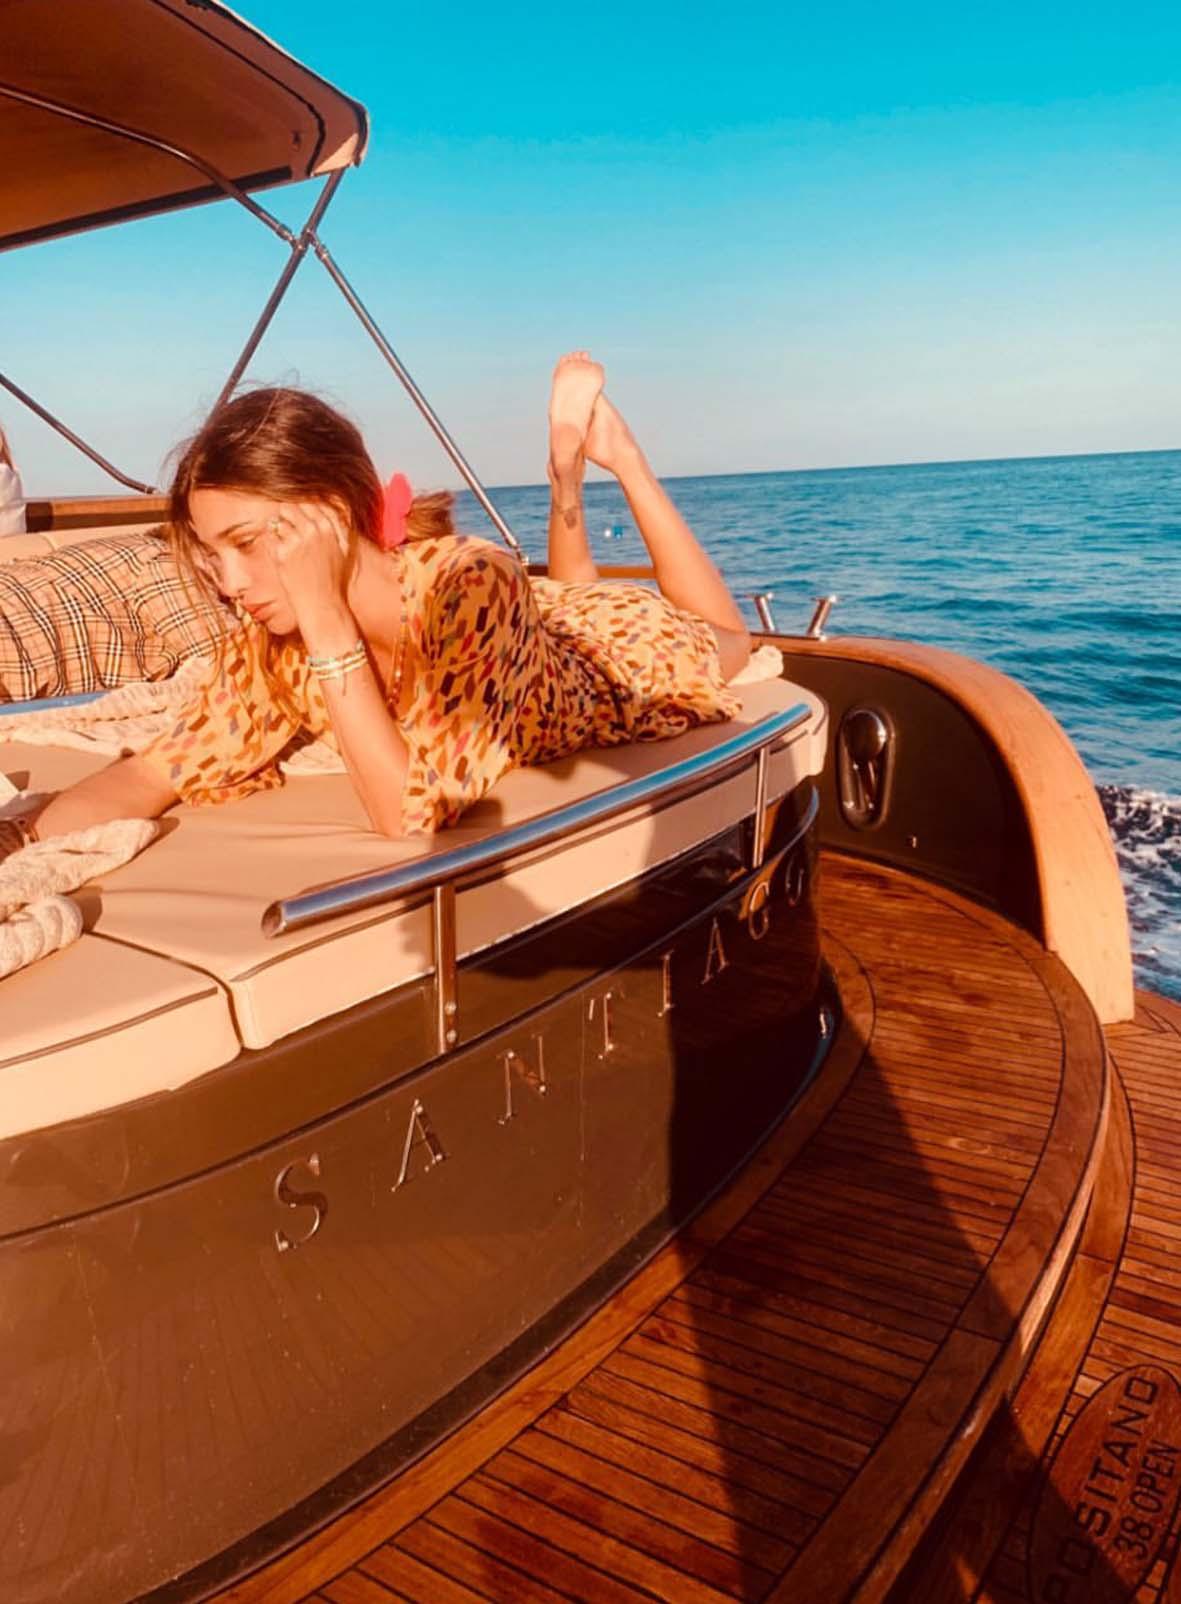 yacht stefano de martino belen rodriguez